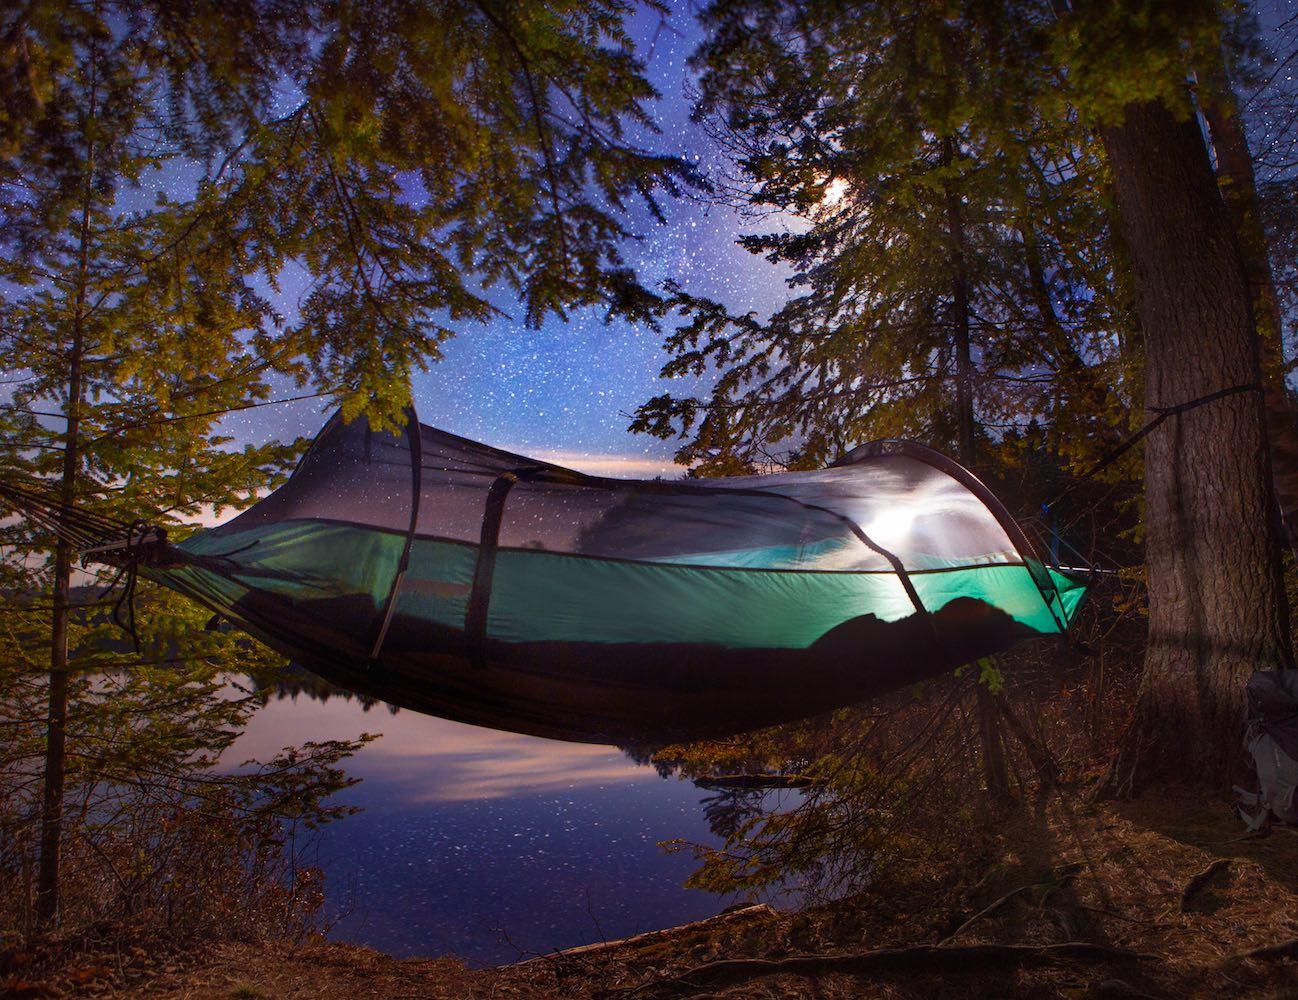 Lawson Hammock Blue Ridge Camping Hammock Review  The